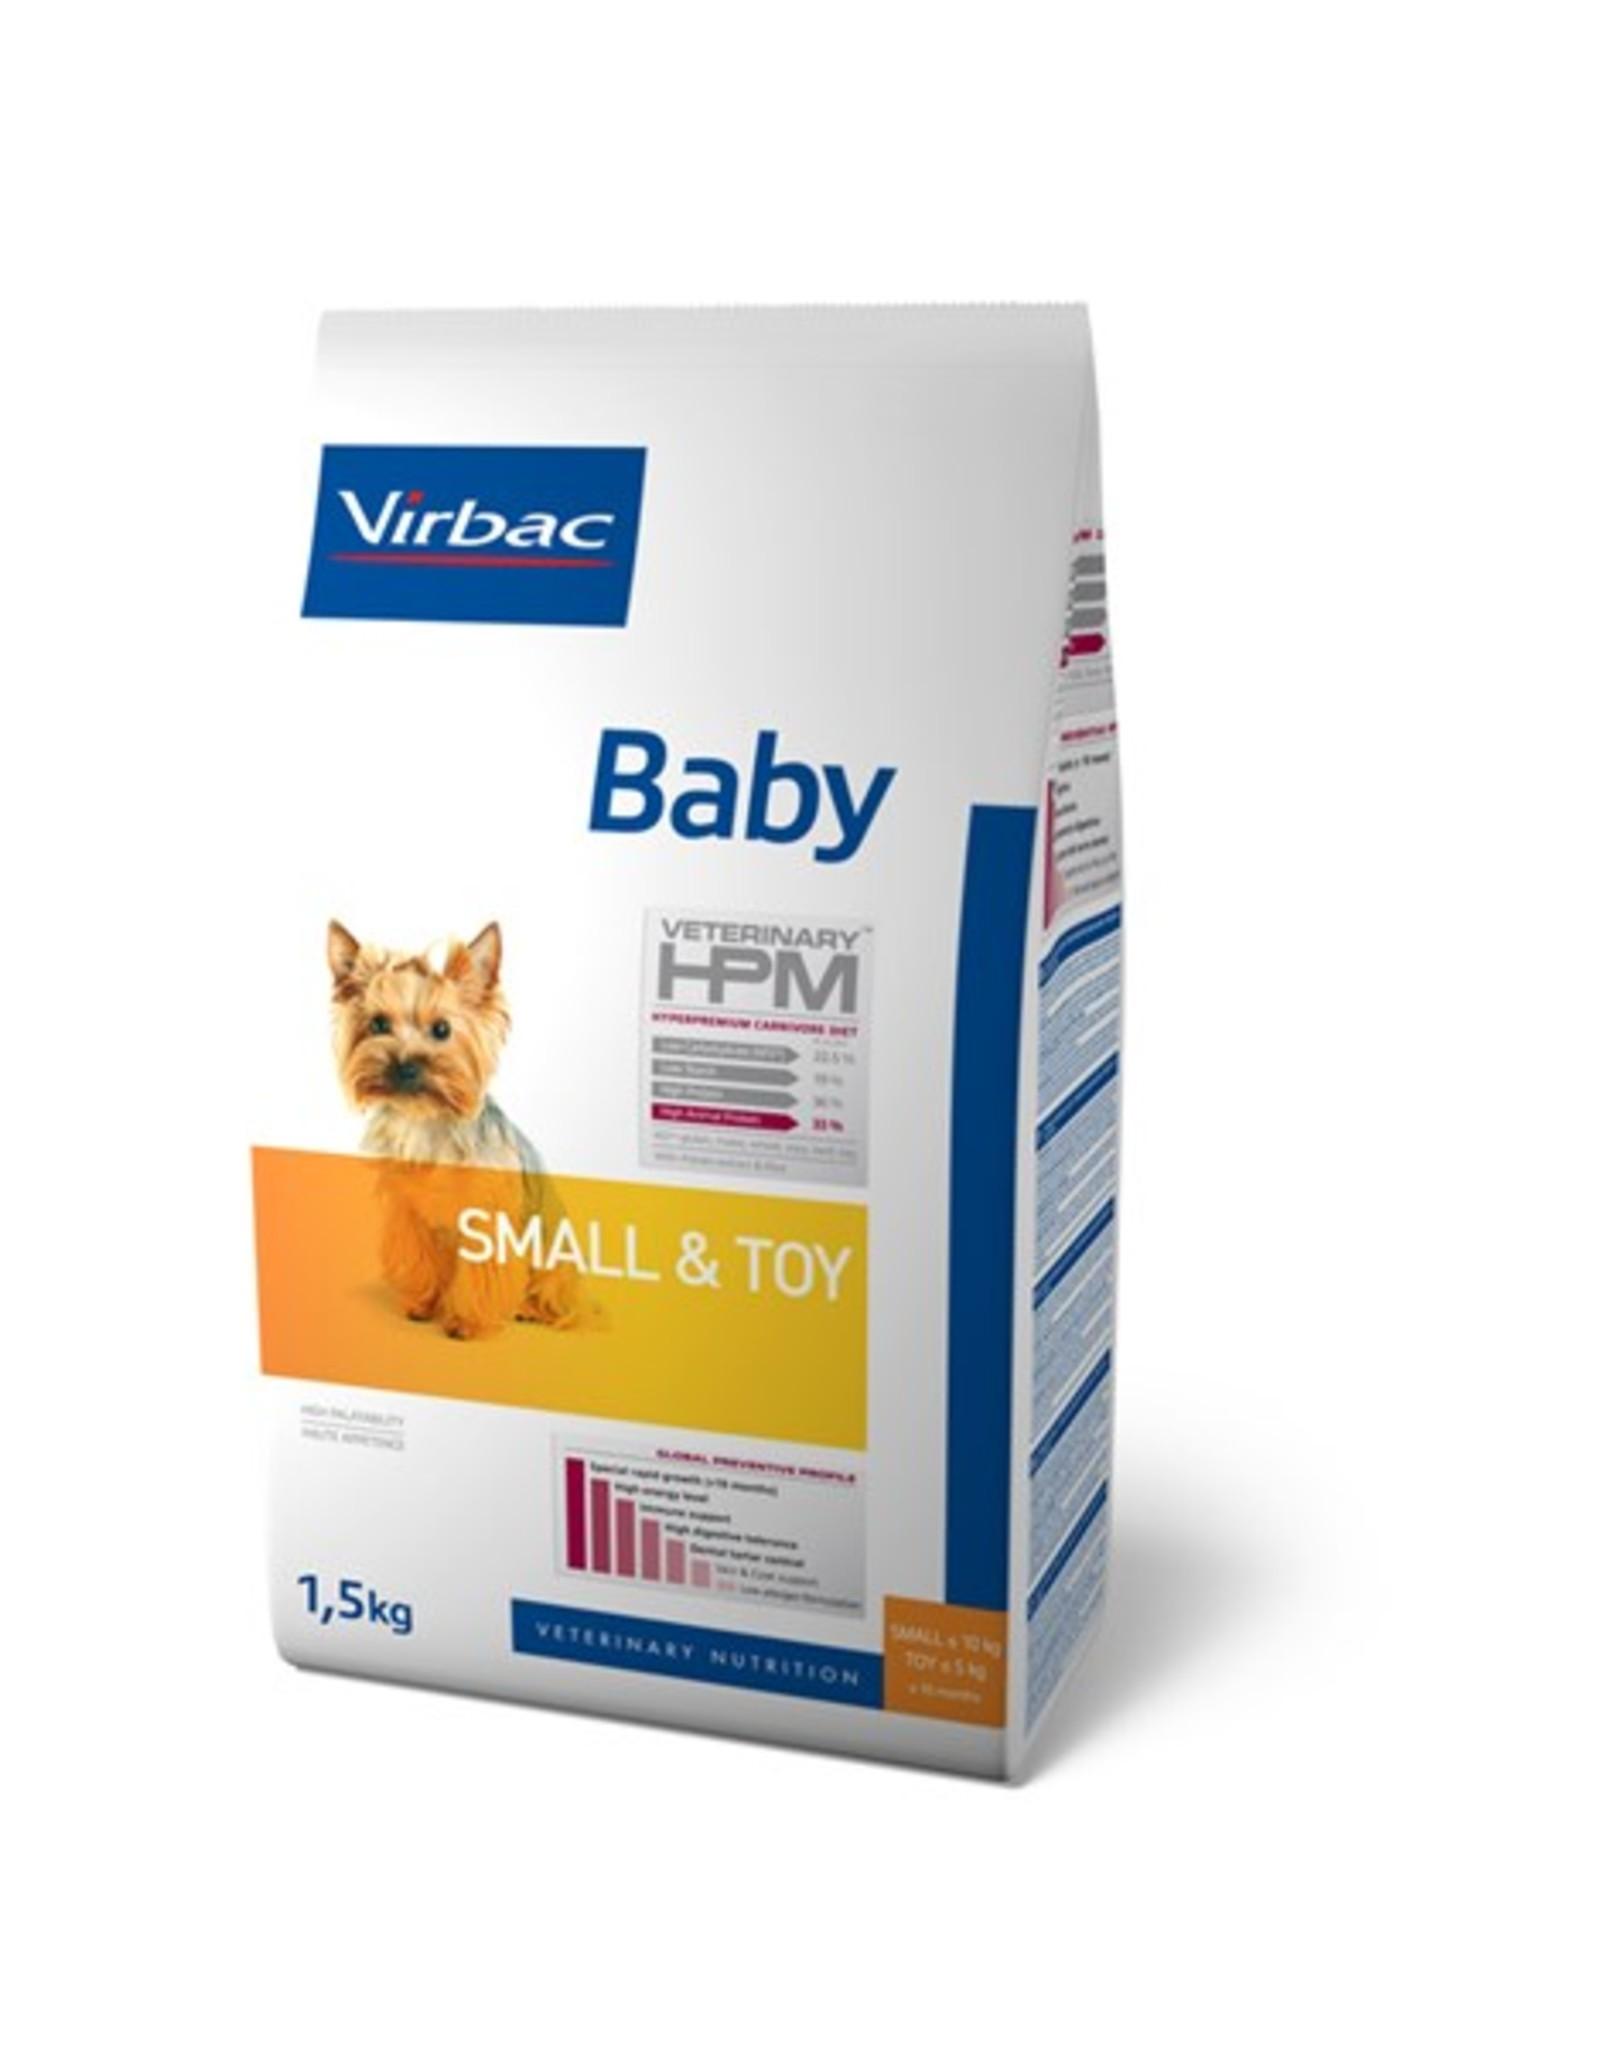 Virbac Virbac Hpm Hund Baby Small Breed/toy 3kg